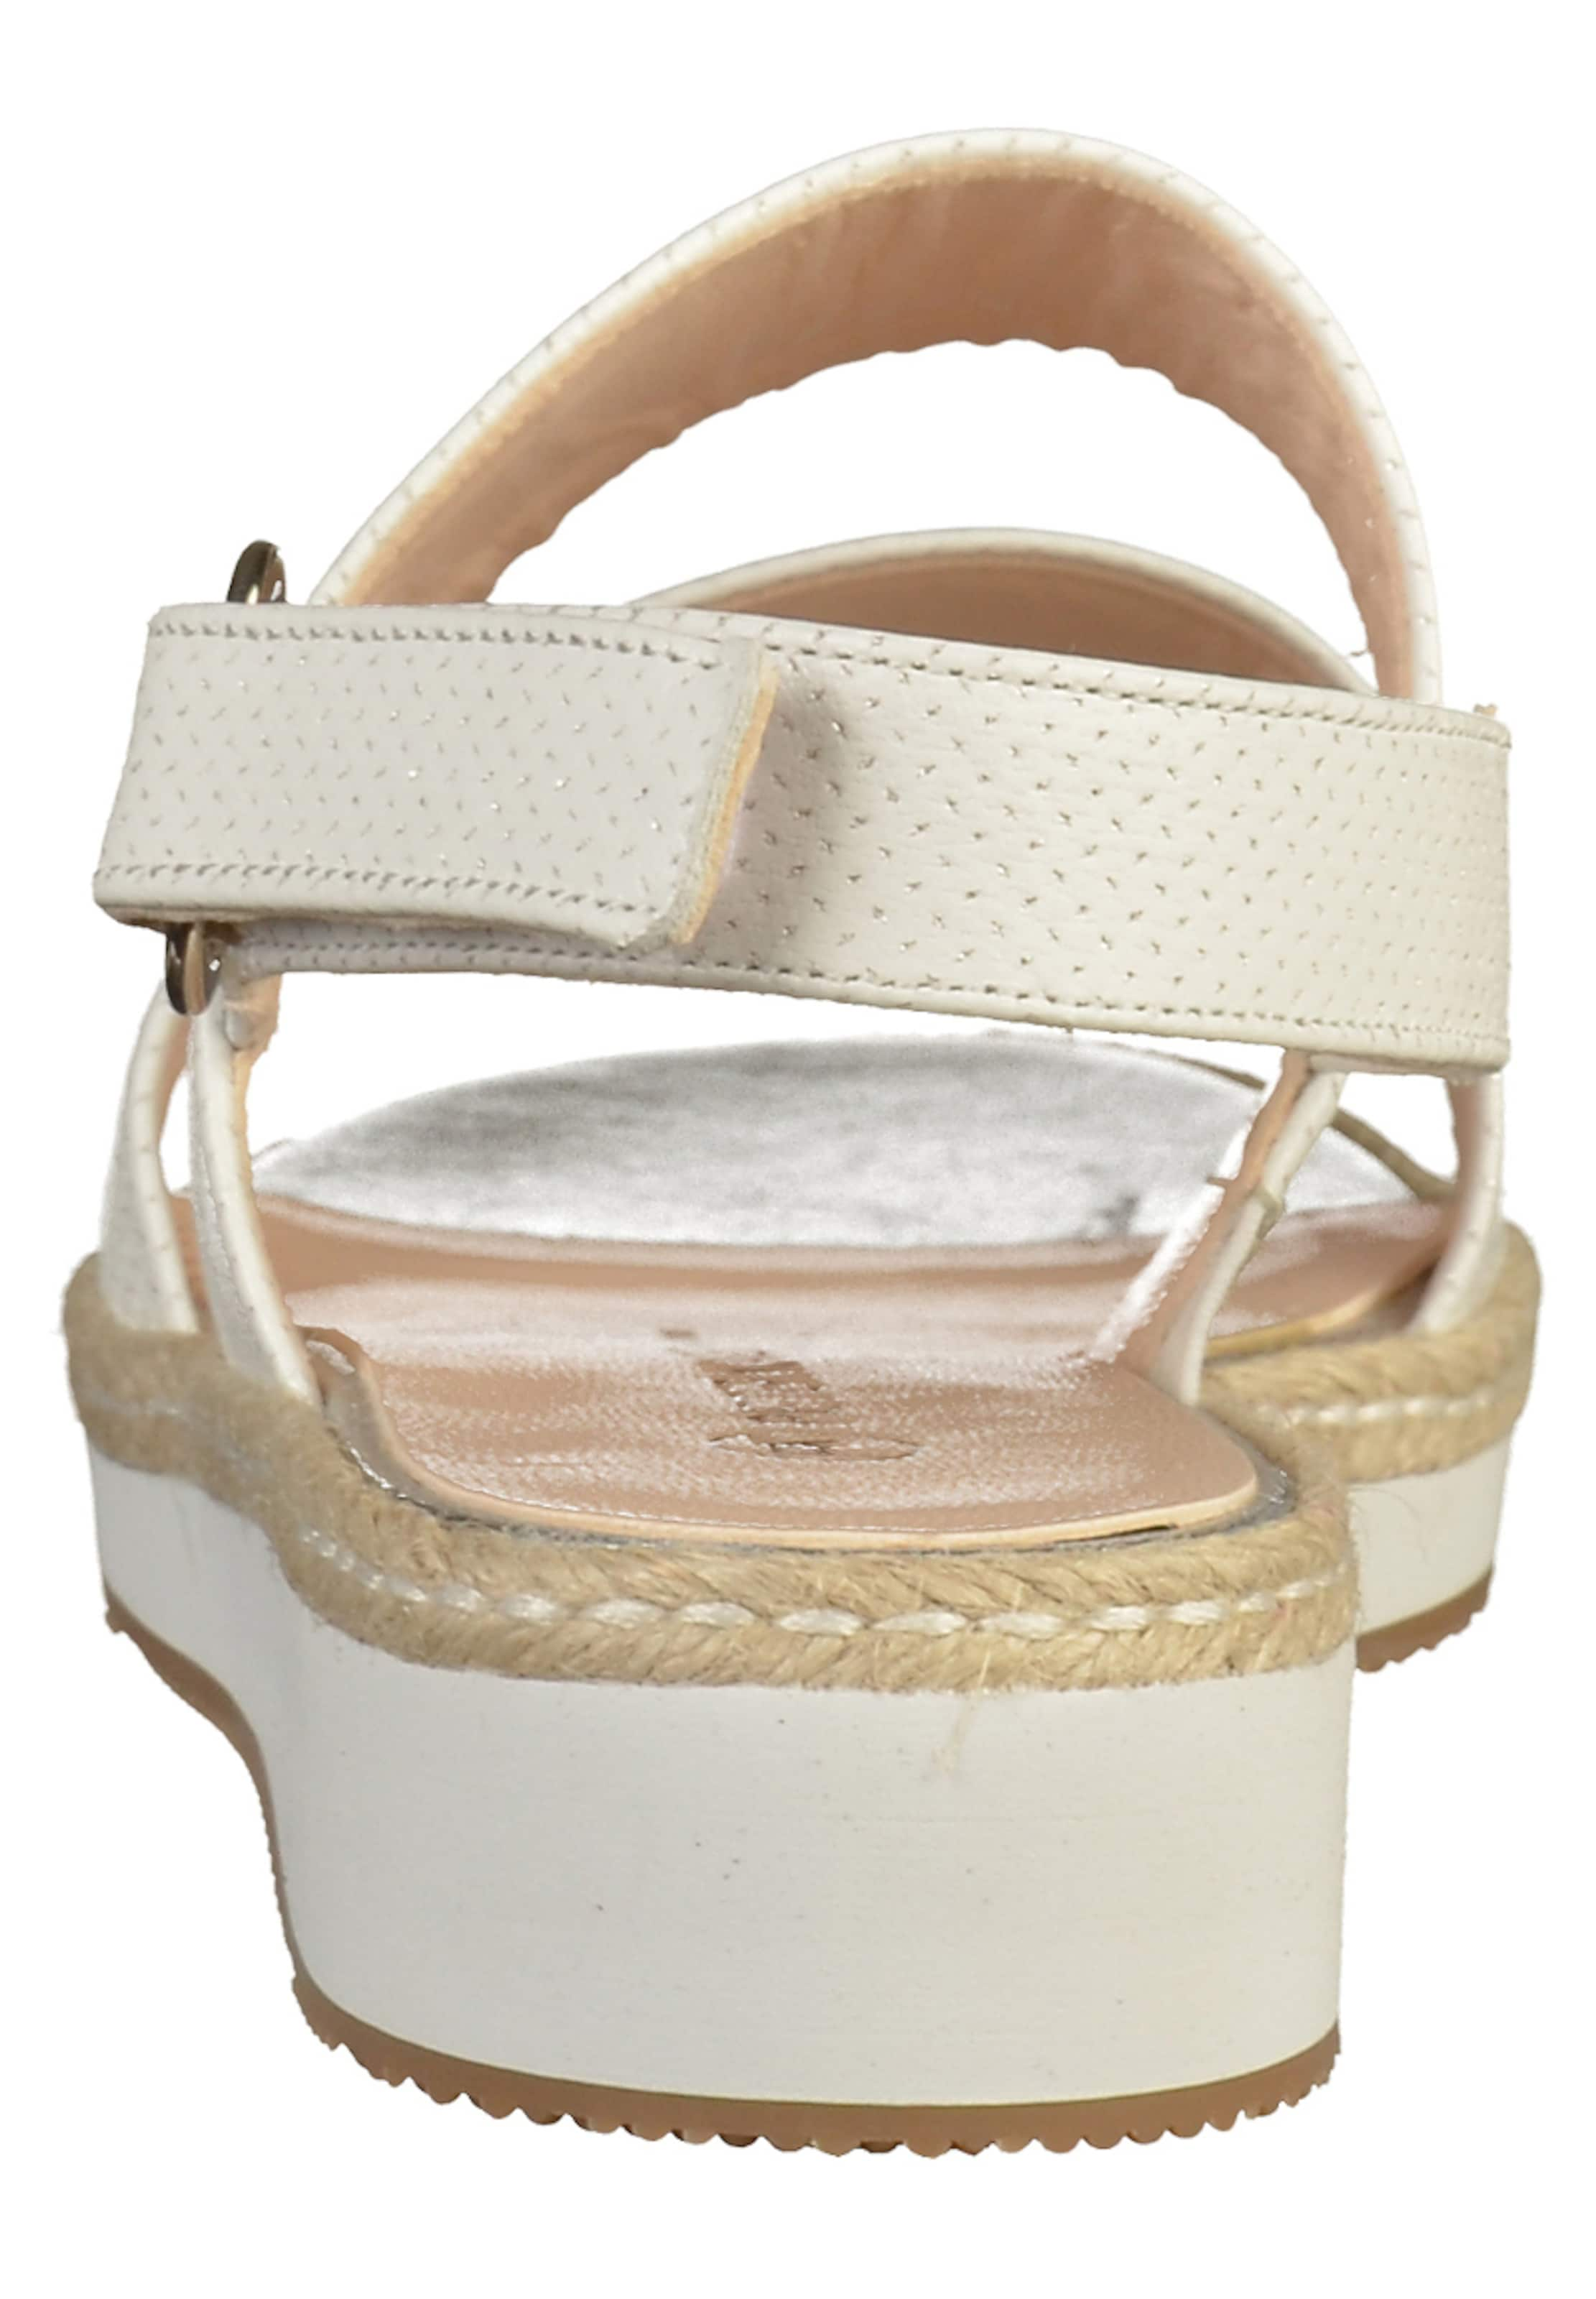 PETER KAISER Sandalen Sandalen Sandalen Leder Bequem, gut aussehend 69ea80